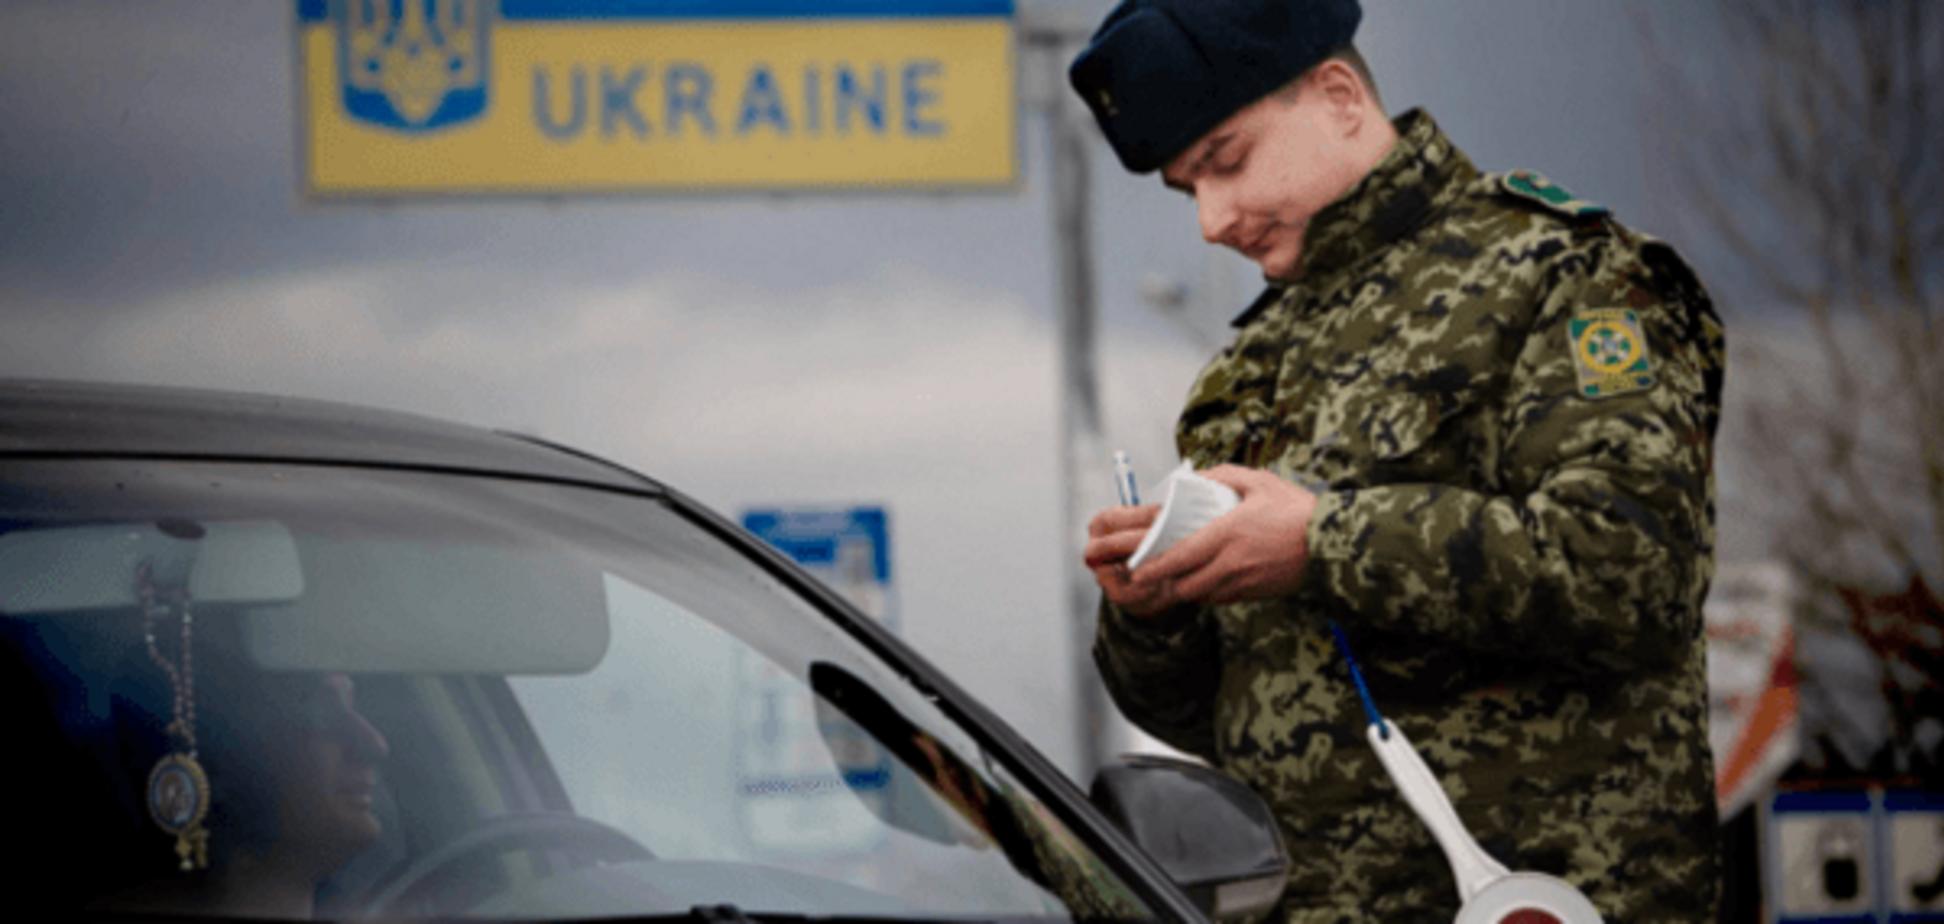 СБУ викрила канал нелегального транспортного сполучення з 'ЛНР'